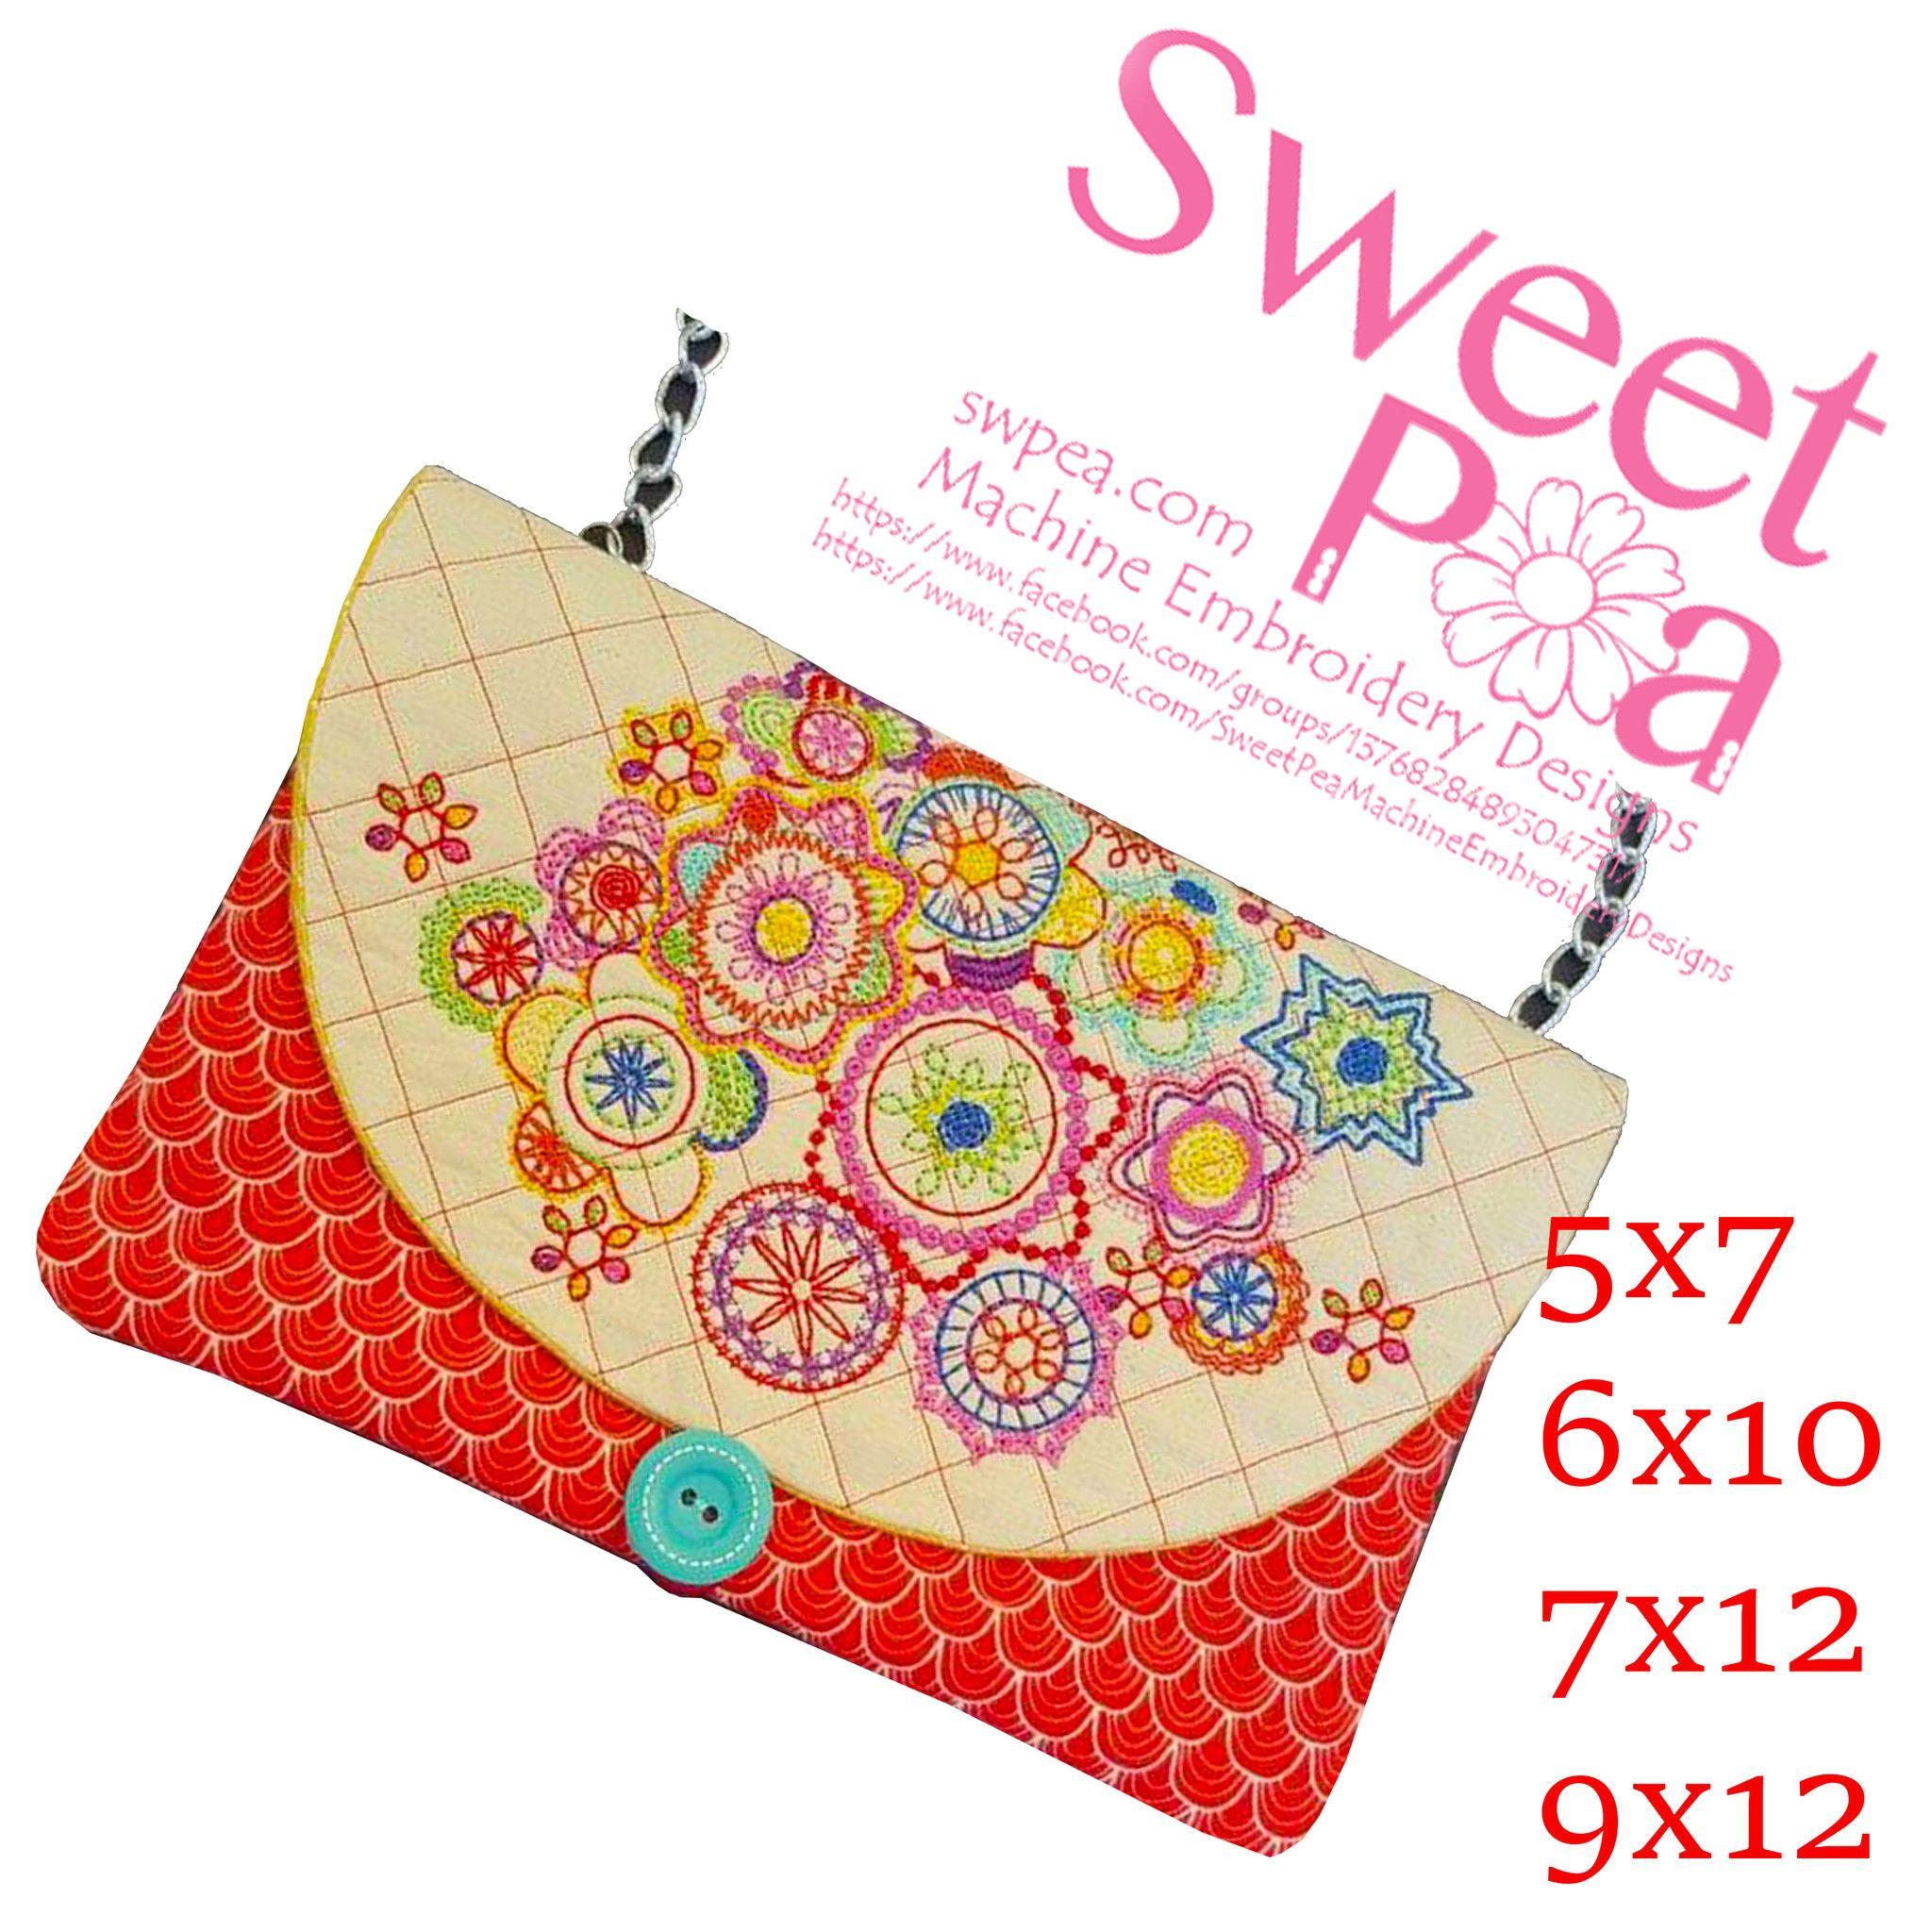 Hobo Clutch Bag 5x7 6x10 7x12 9x12 Machine embroidery